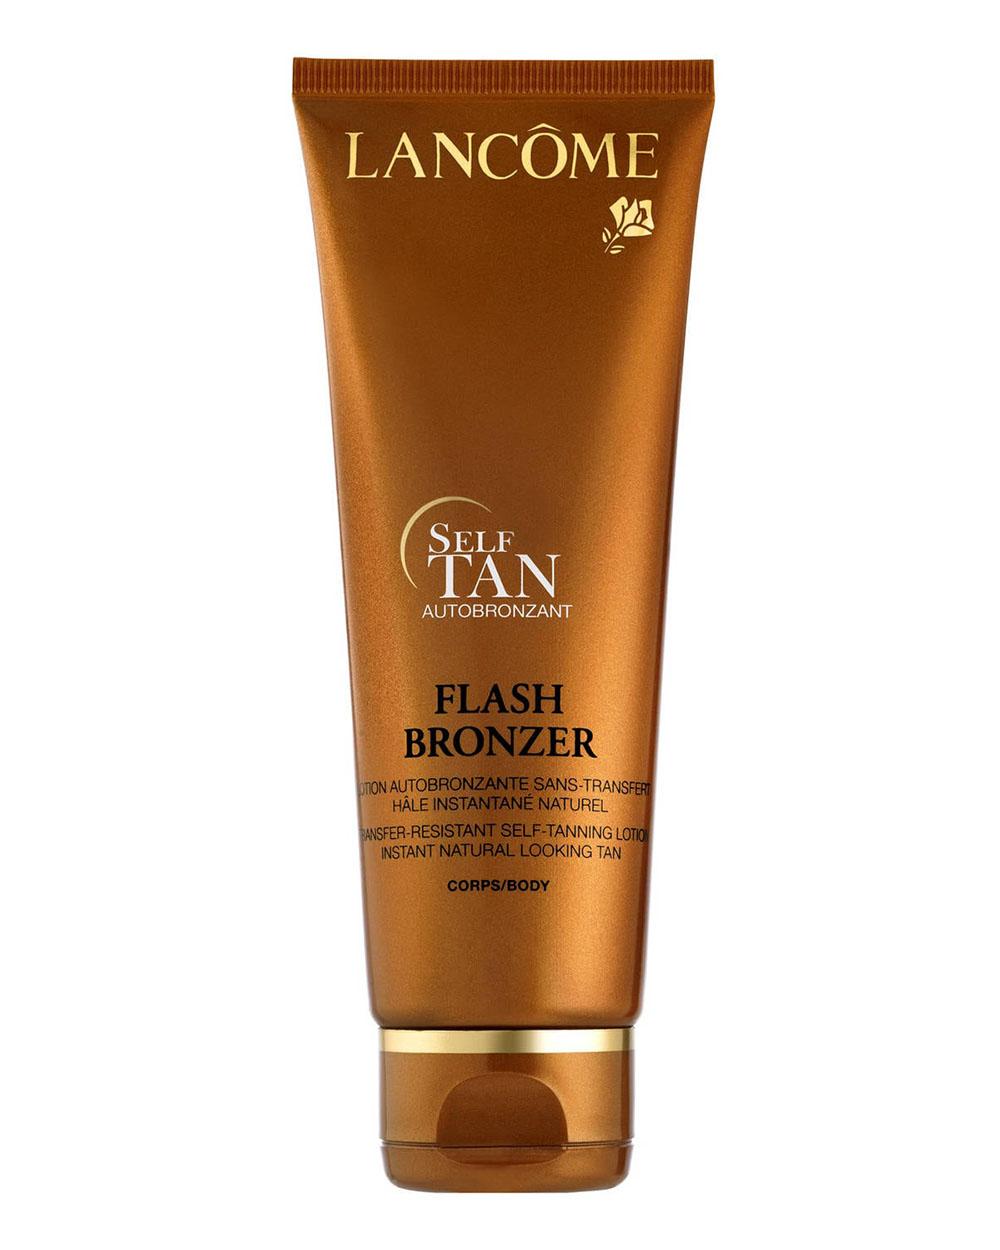 LANCÔME - Flash Bronzer